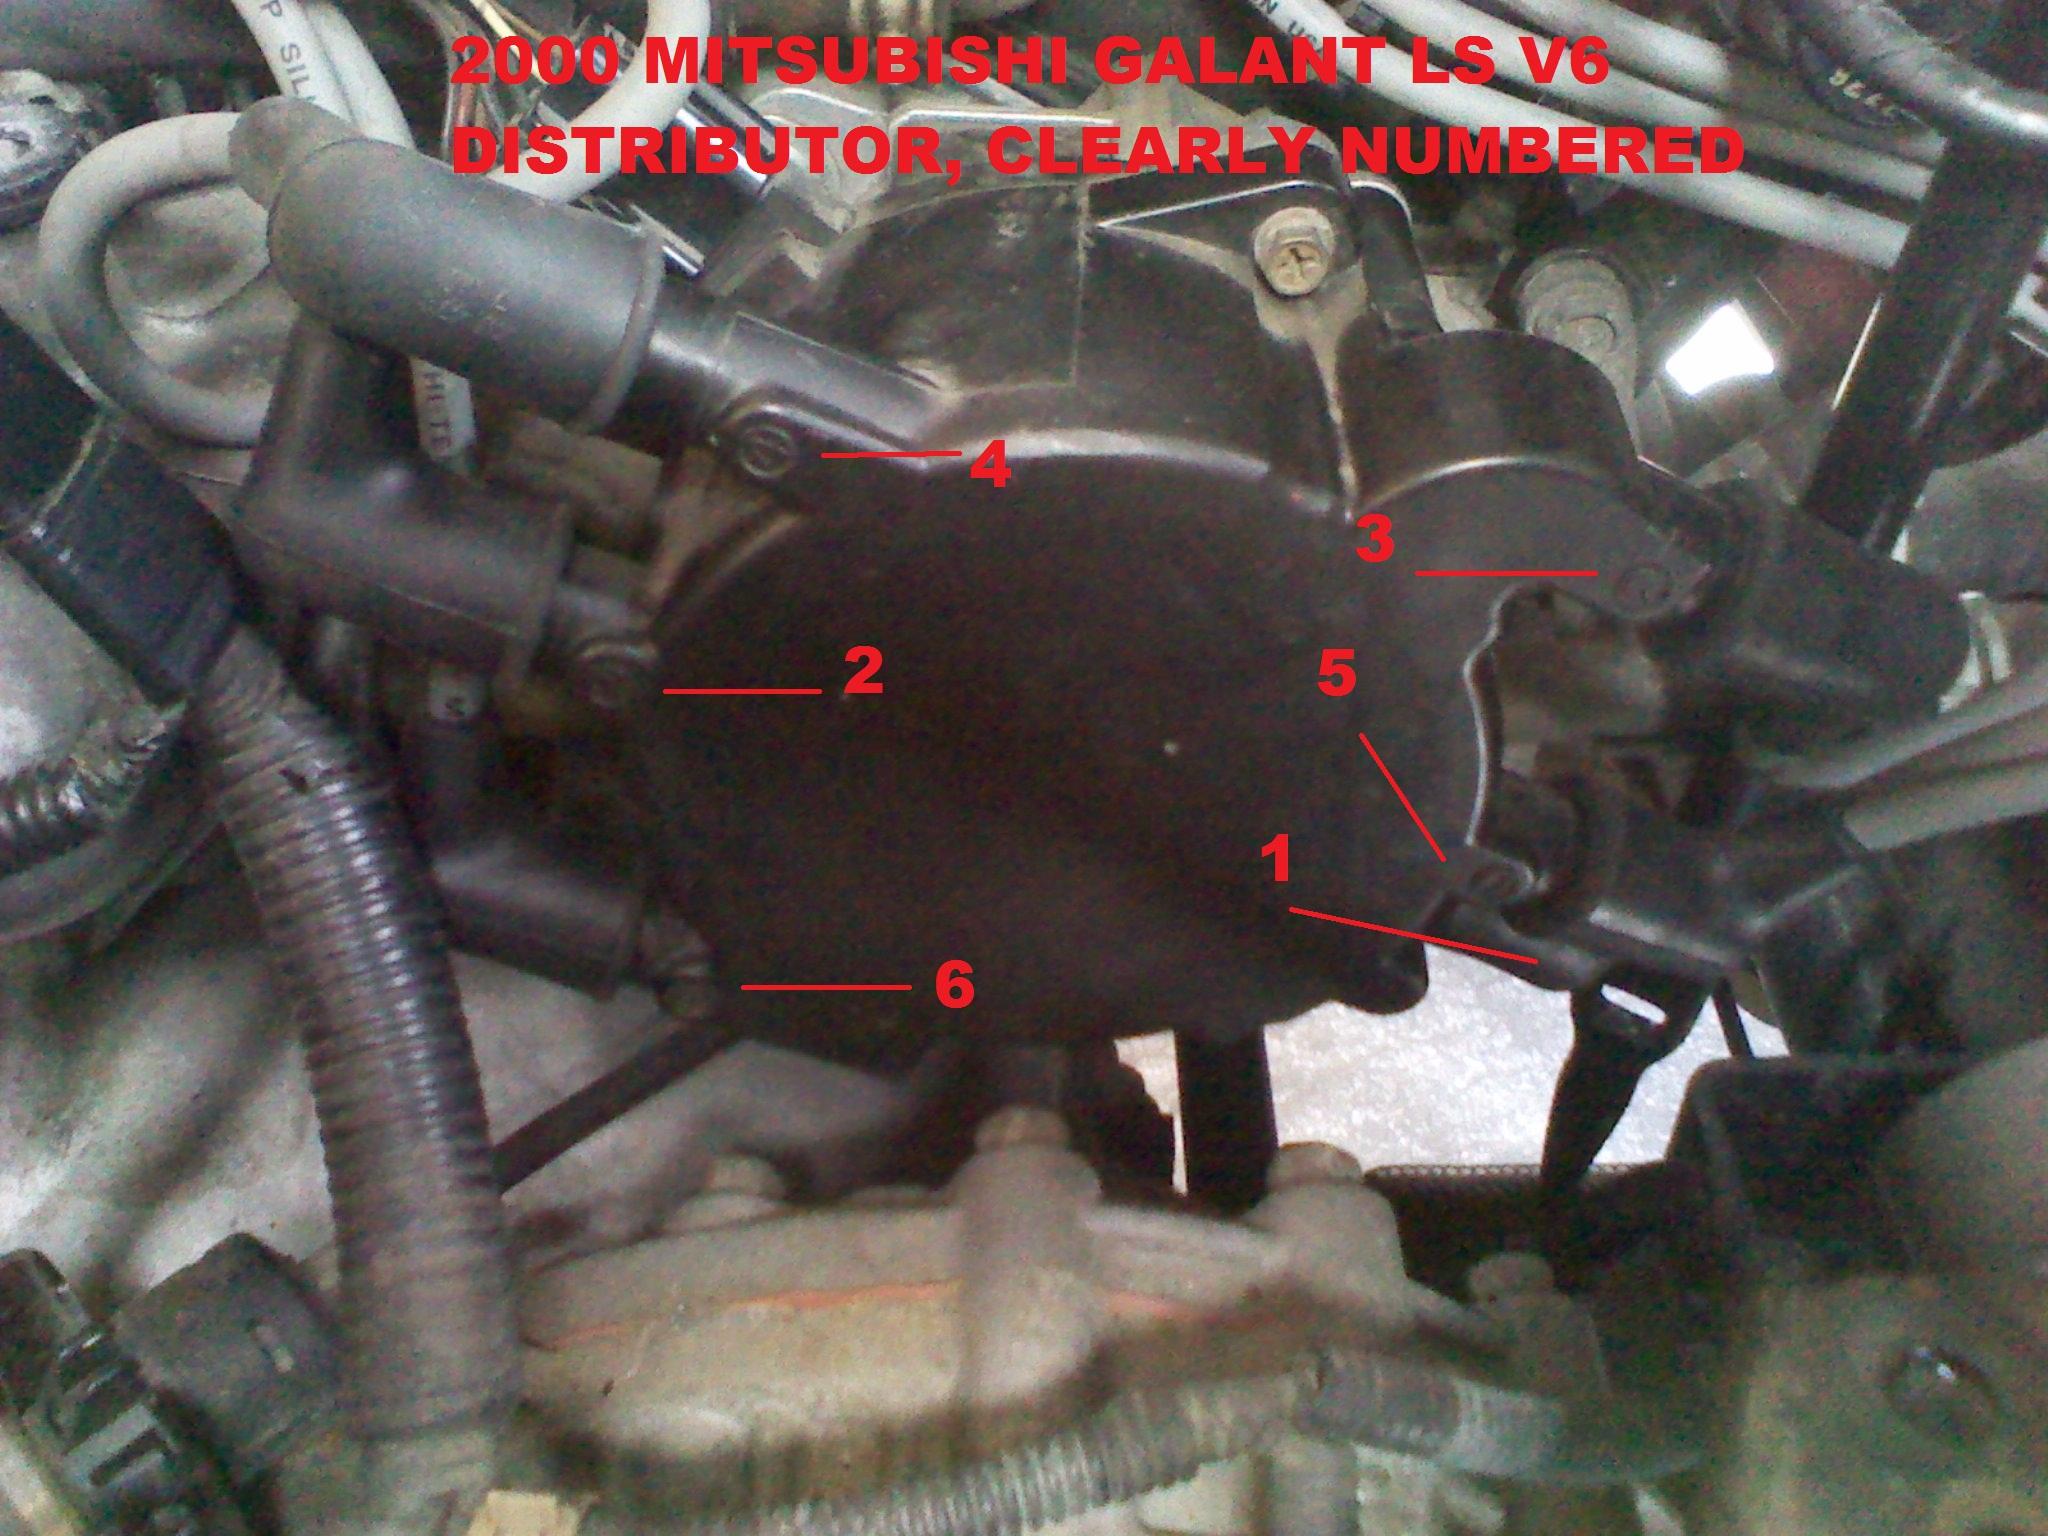 Mitsubishi Galant Ignition Wiring Diagram Further Mitsubishi Ignition